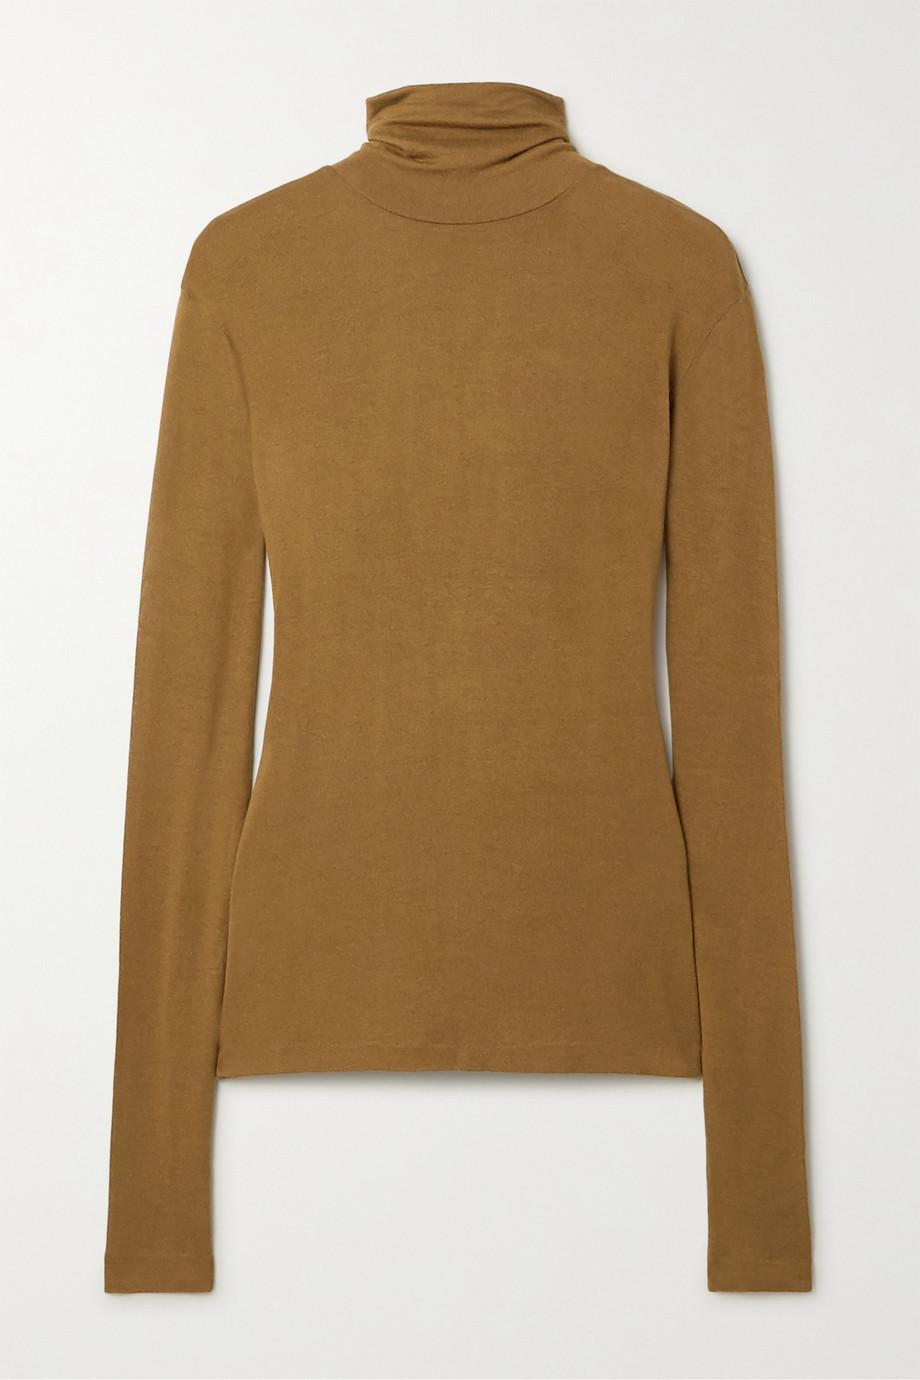 Totême Arenzano stretch-knit turtleneck sweater